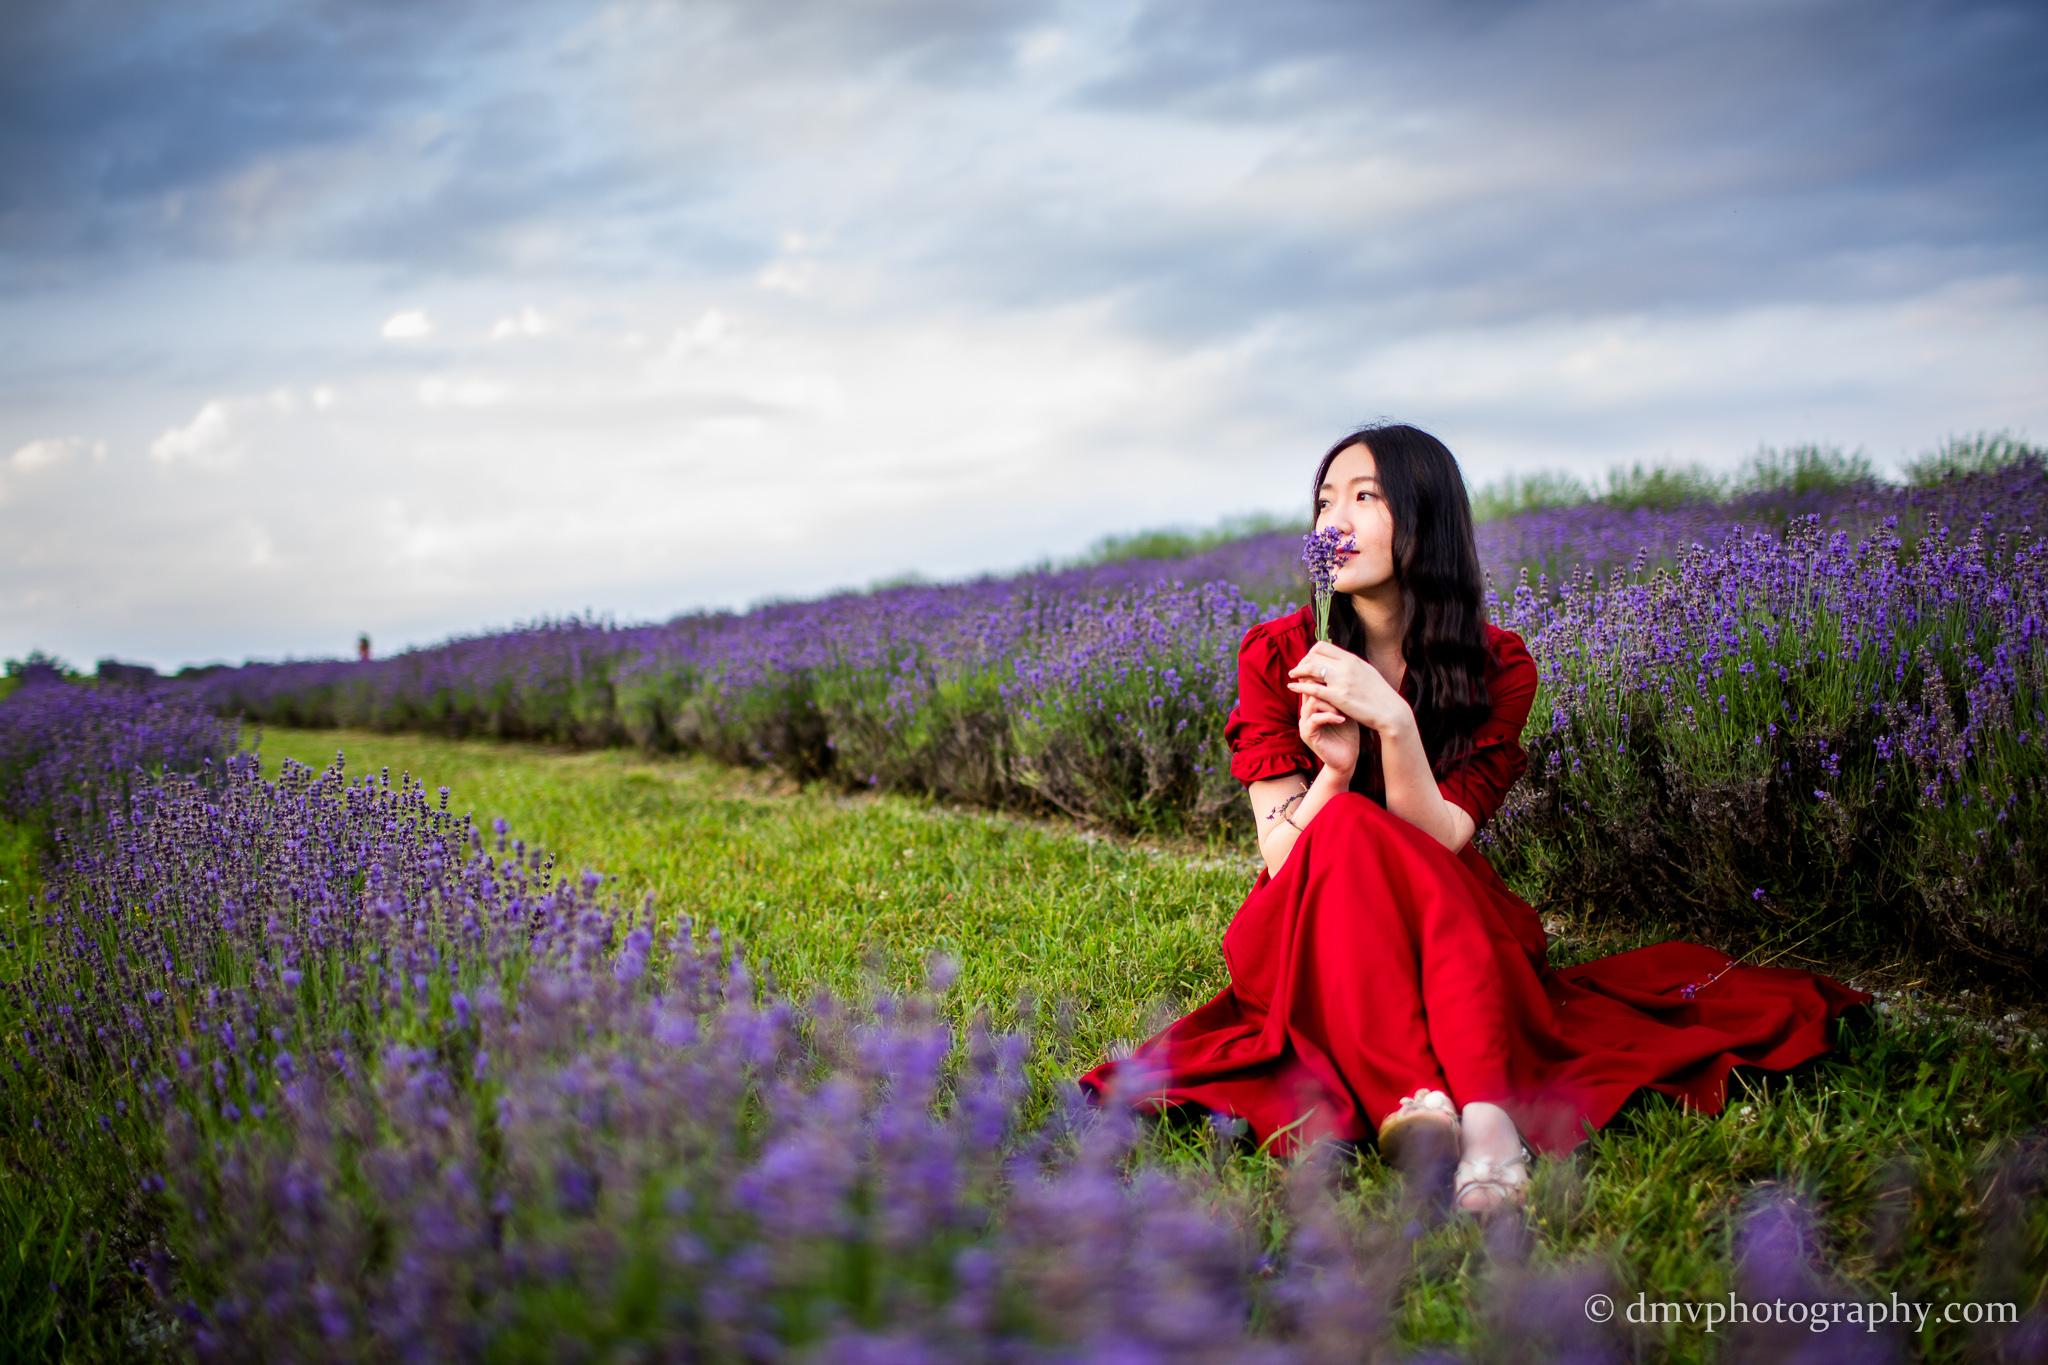 2016-06-24 - Zhu Xing - Lavender Field - 00036